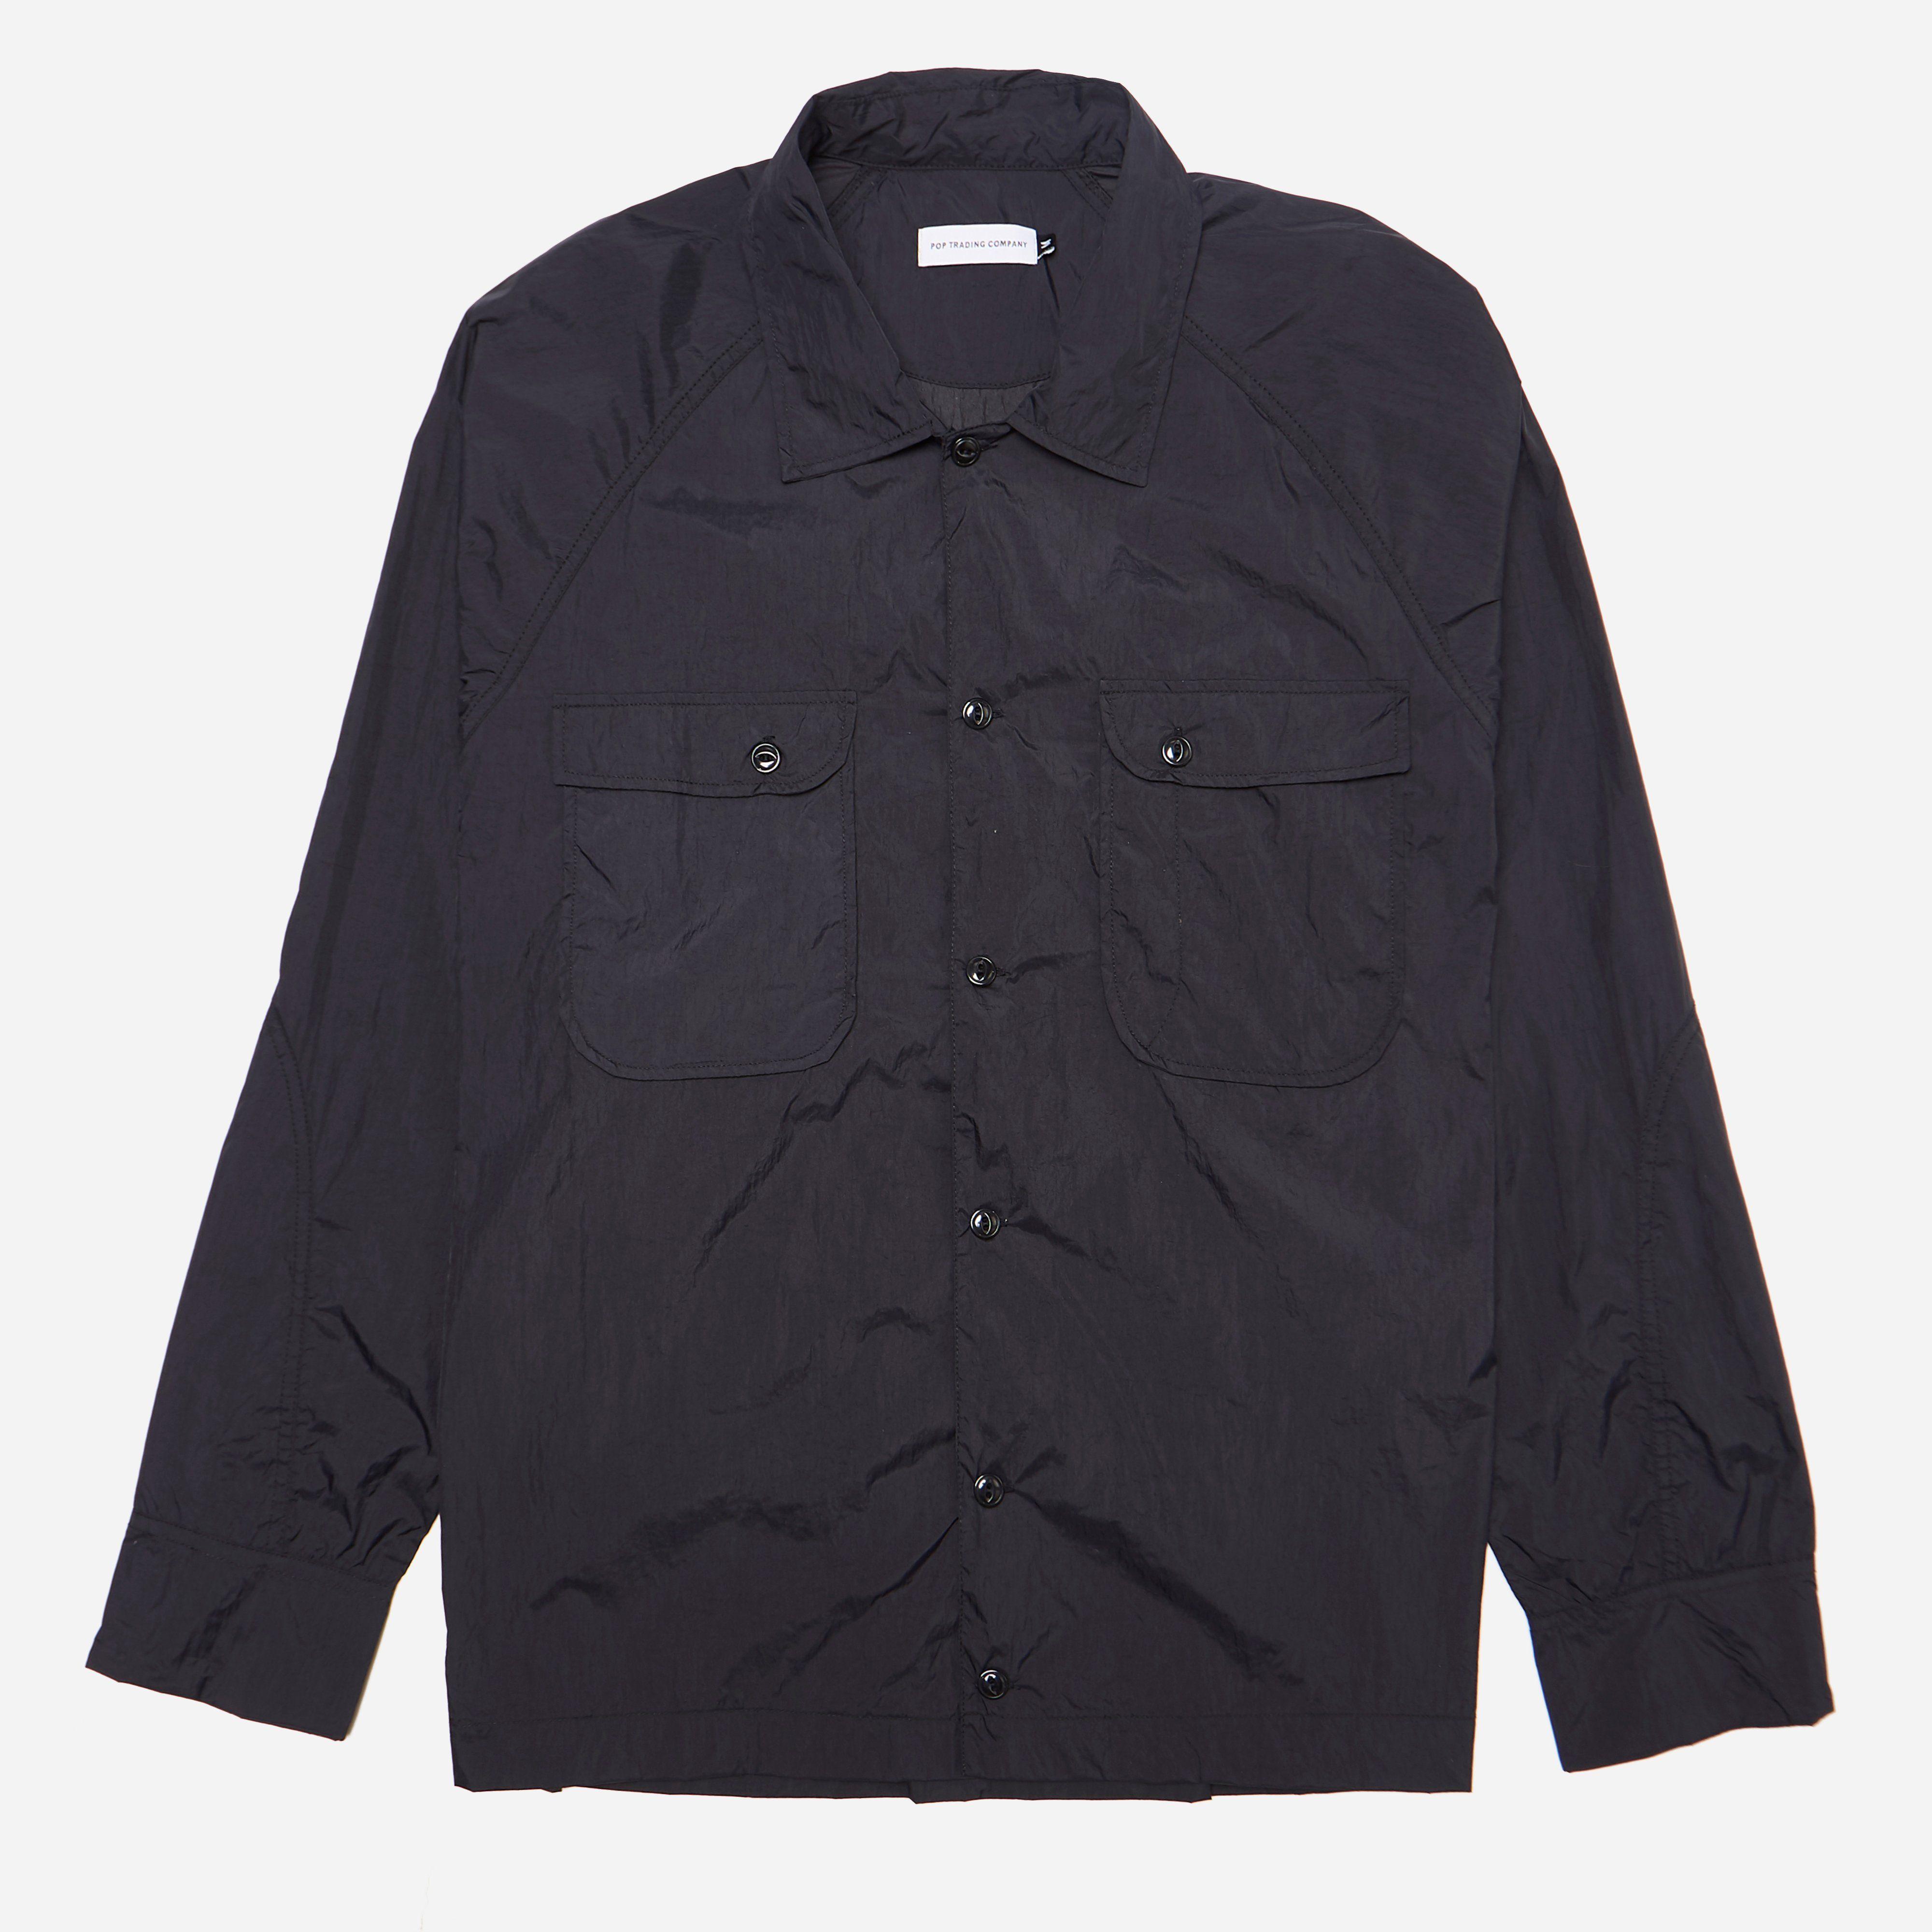 Pop Trading Company Herman Shirt